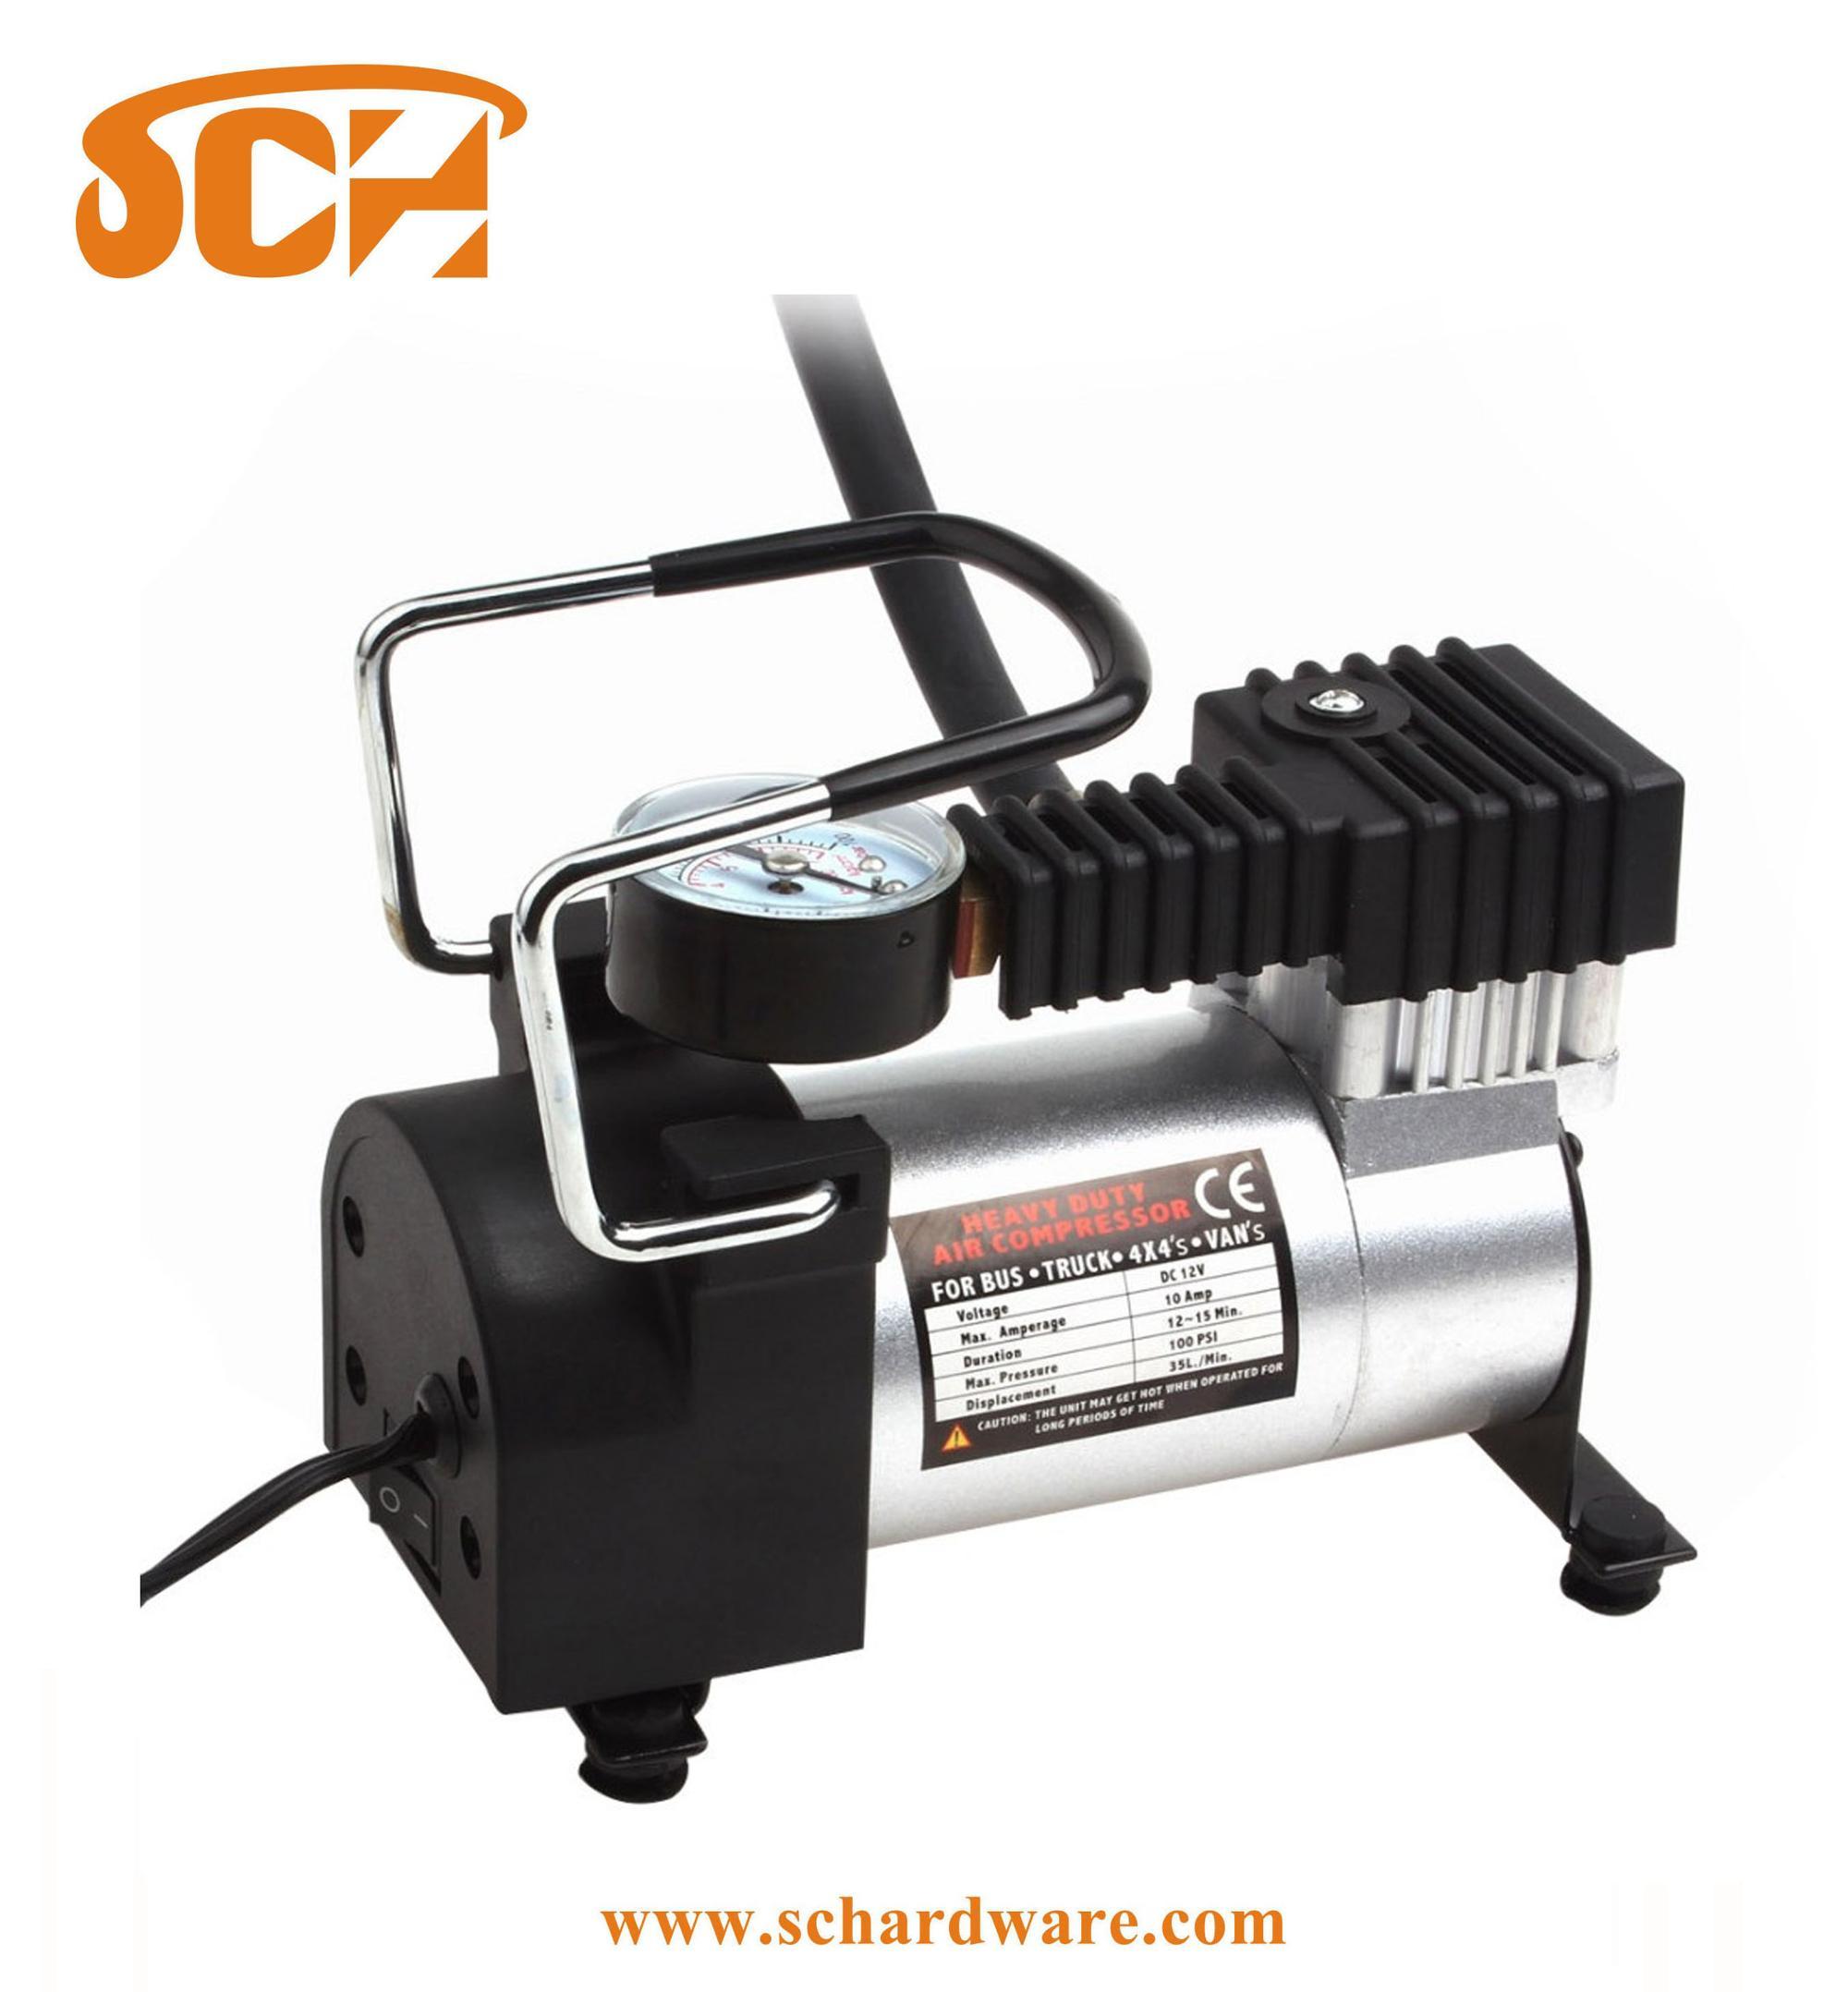 New Portable Digital Tire Inflator DC 12V 120W Car Electric Air Compressor Pump